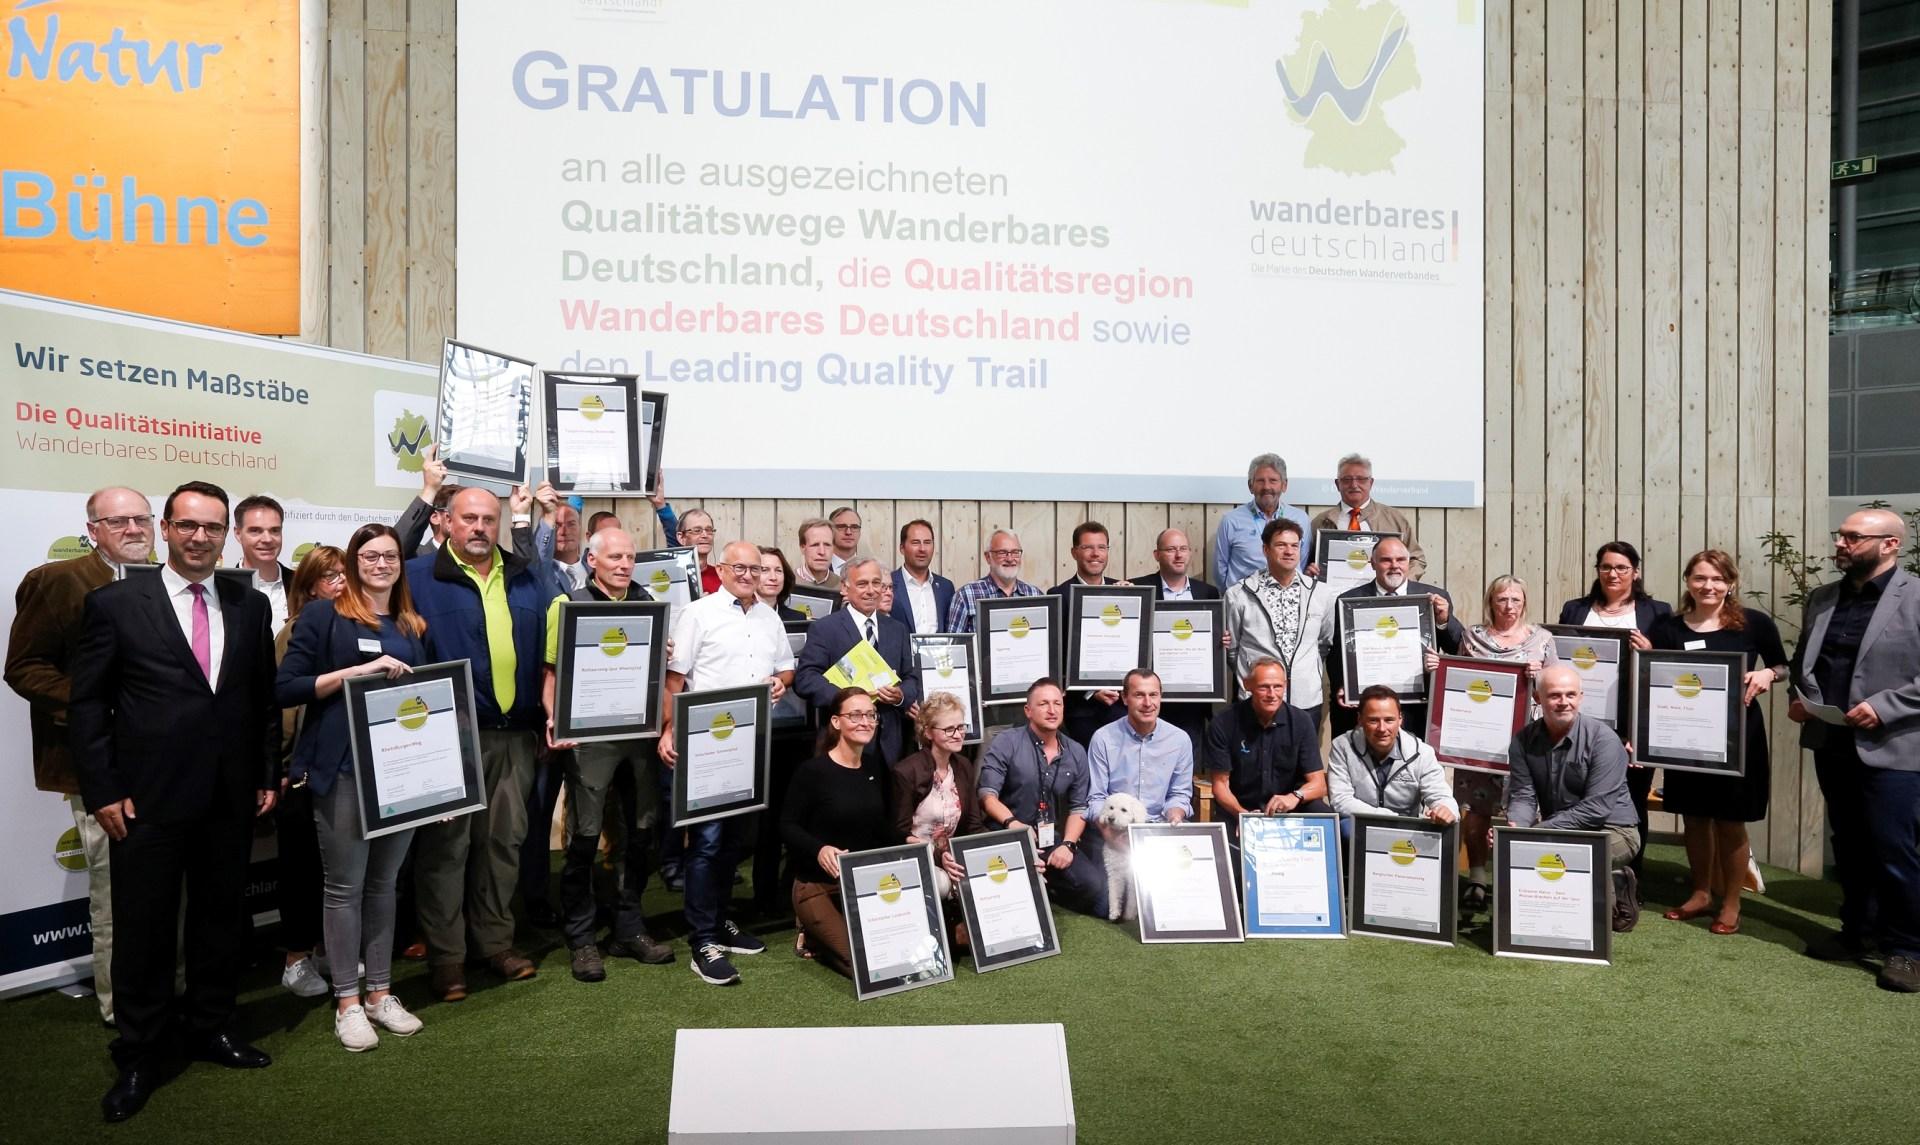 Verleihung Qualitätswege TourNatur 2019